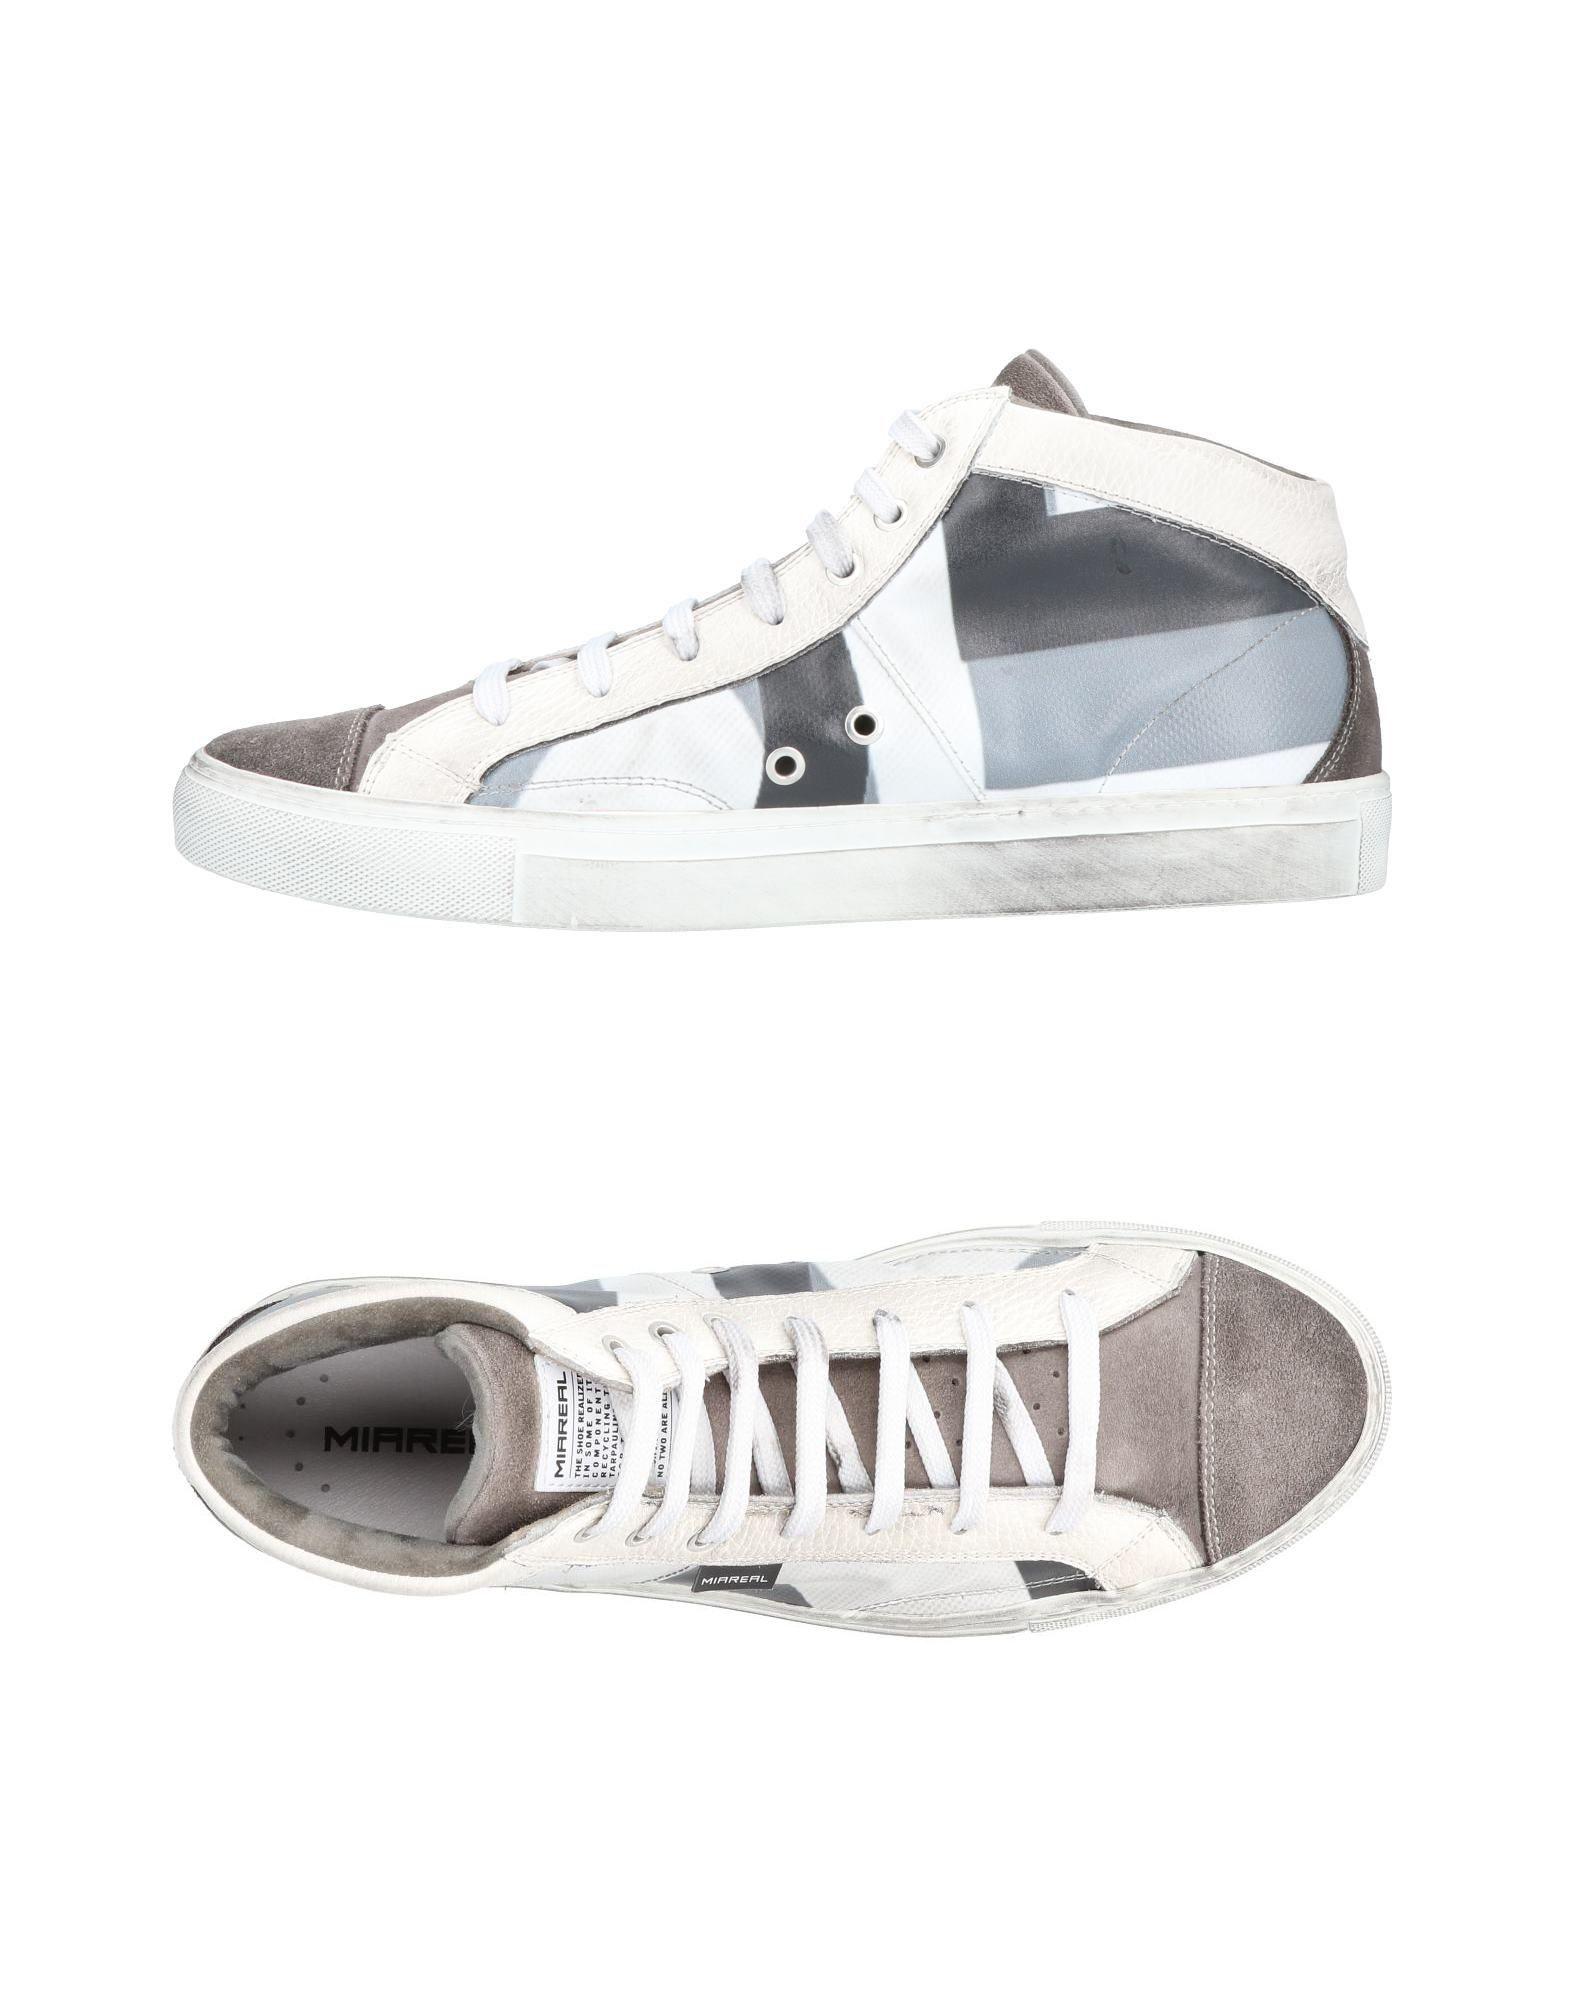 Miareal Newborn Shoes